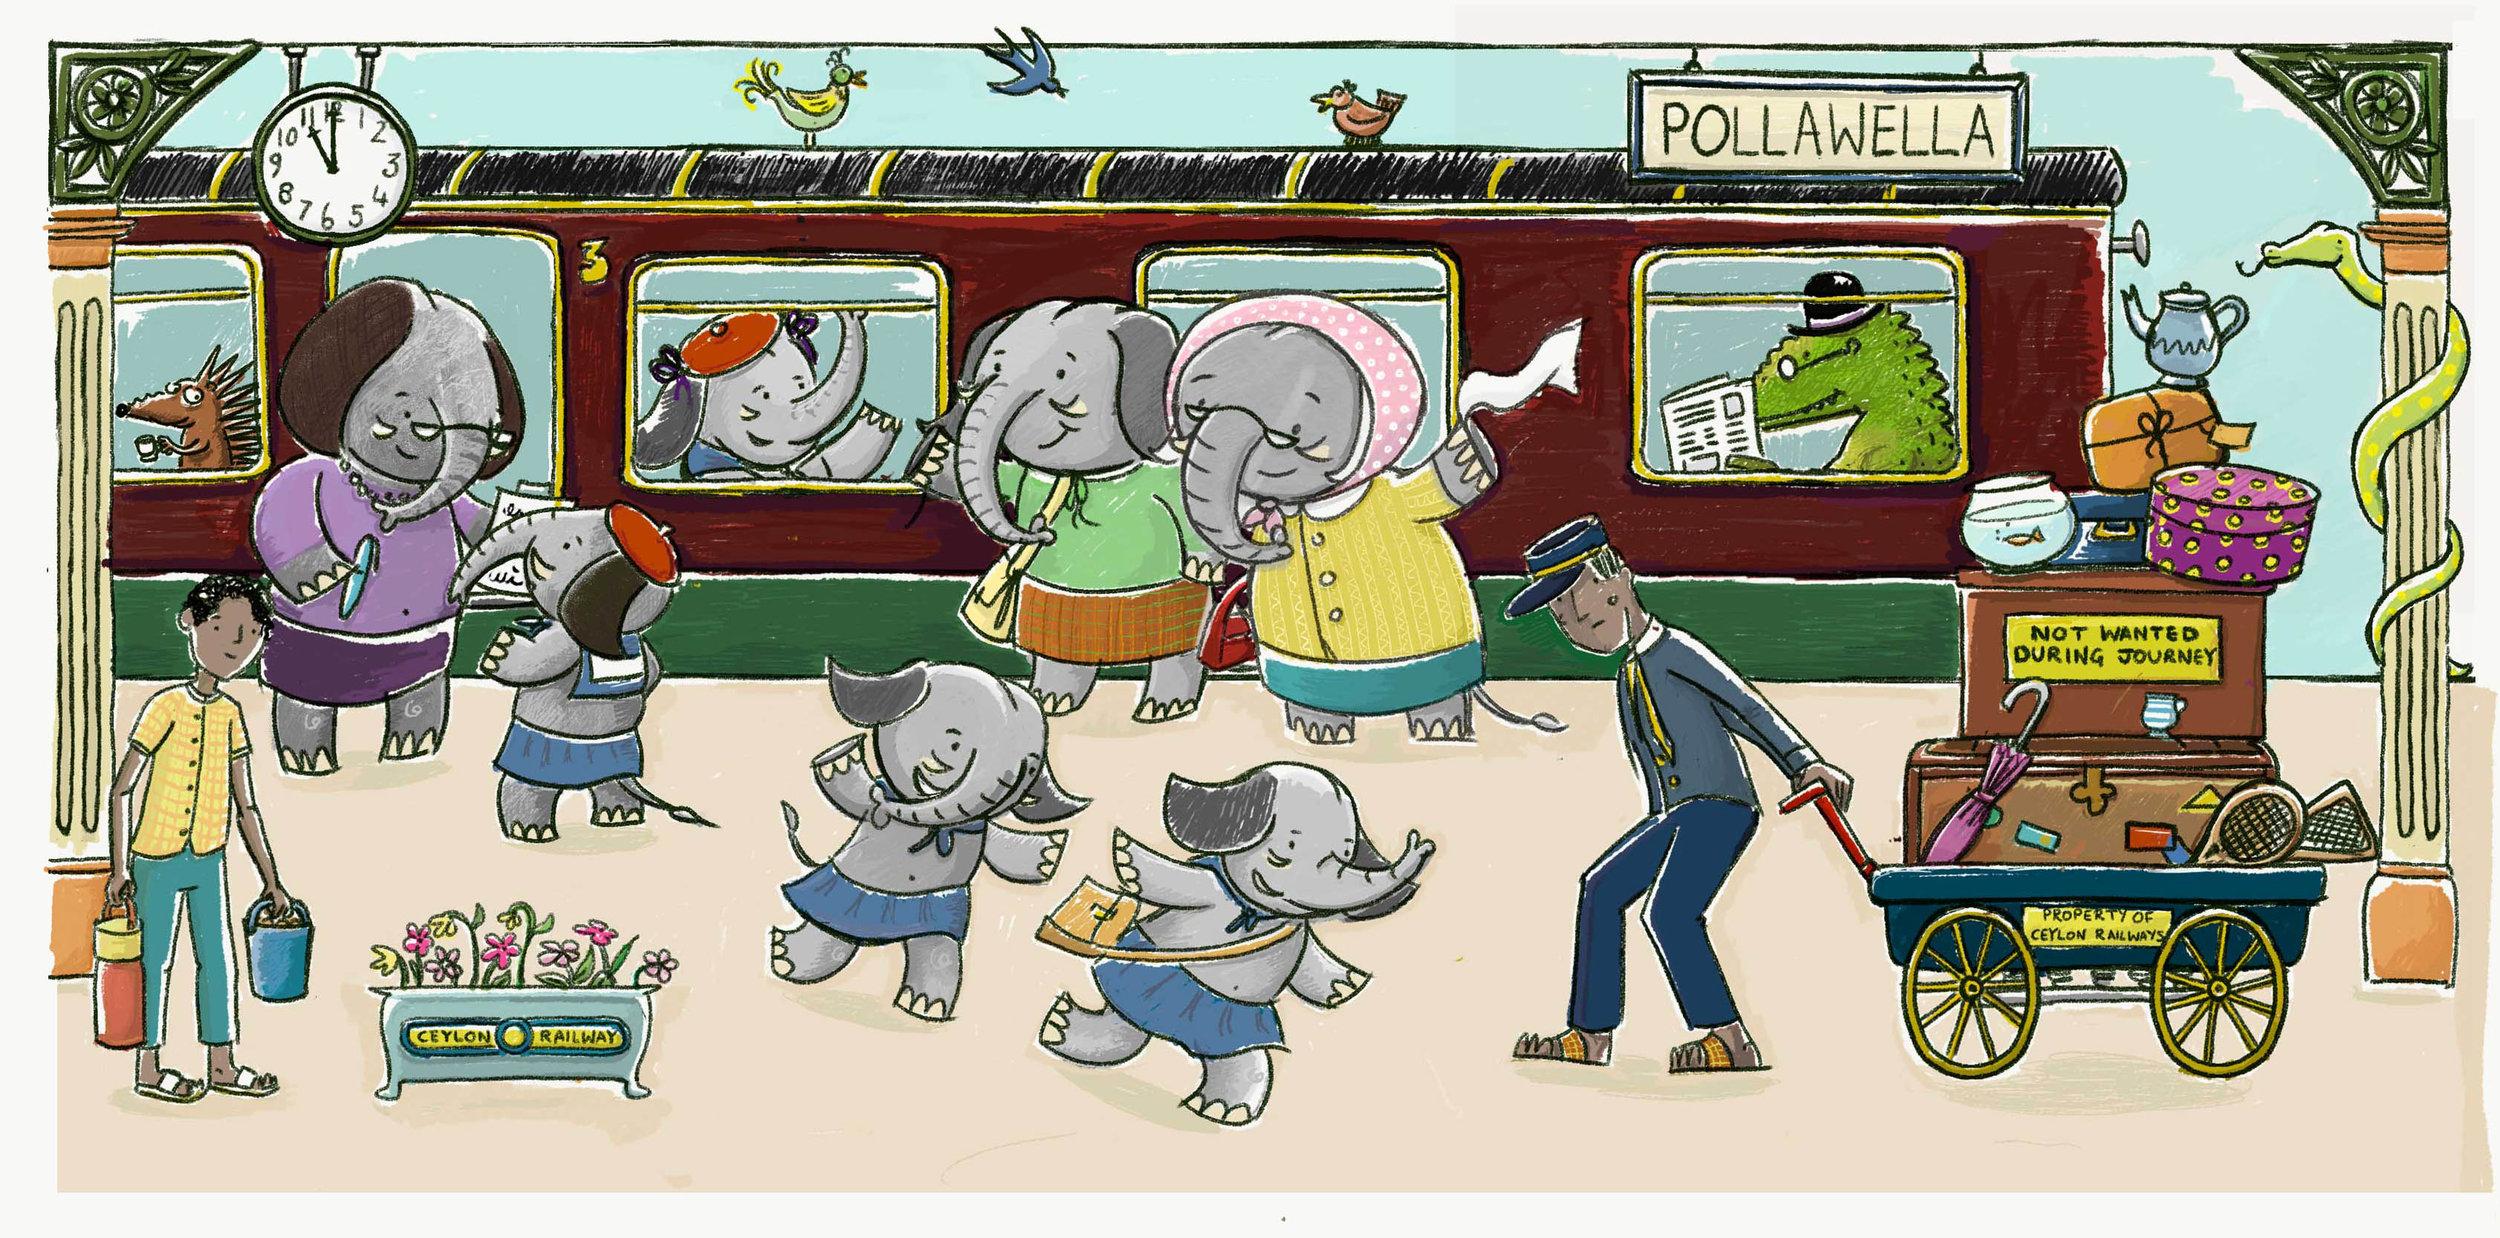 Railway scene inspired by my sketchs of Sri Lanka